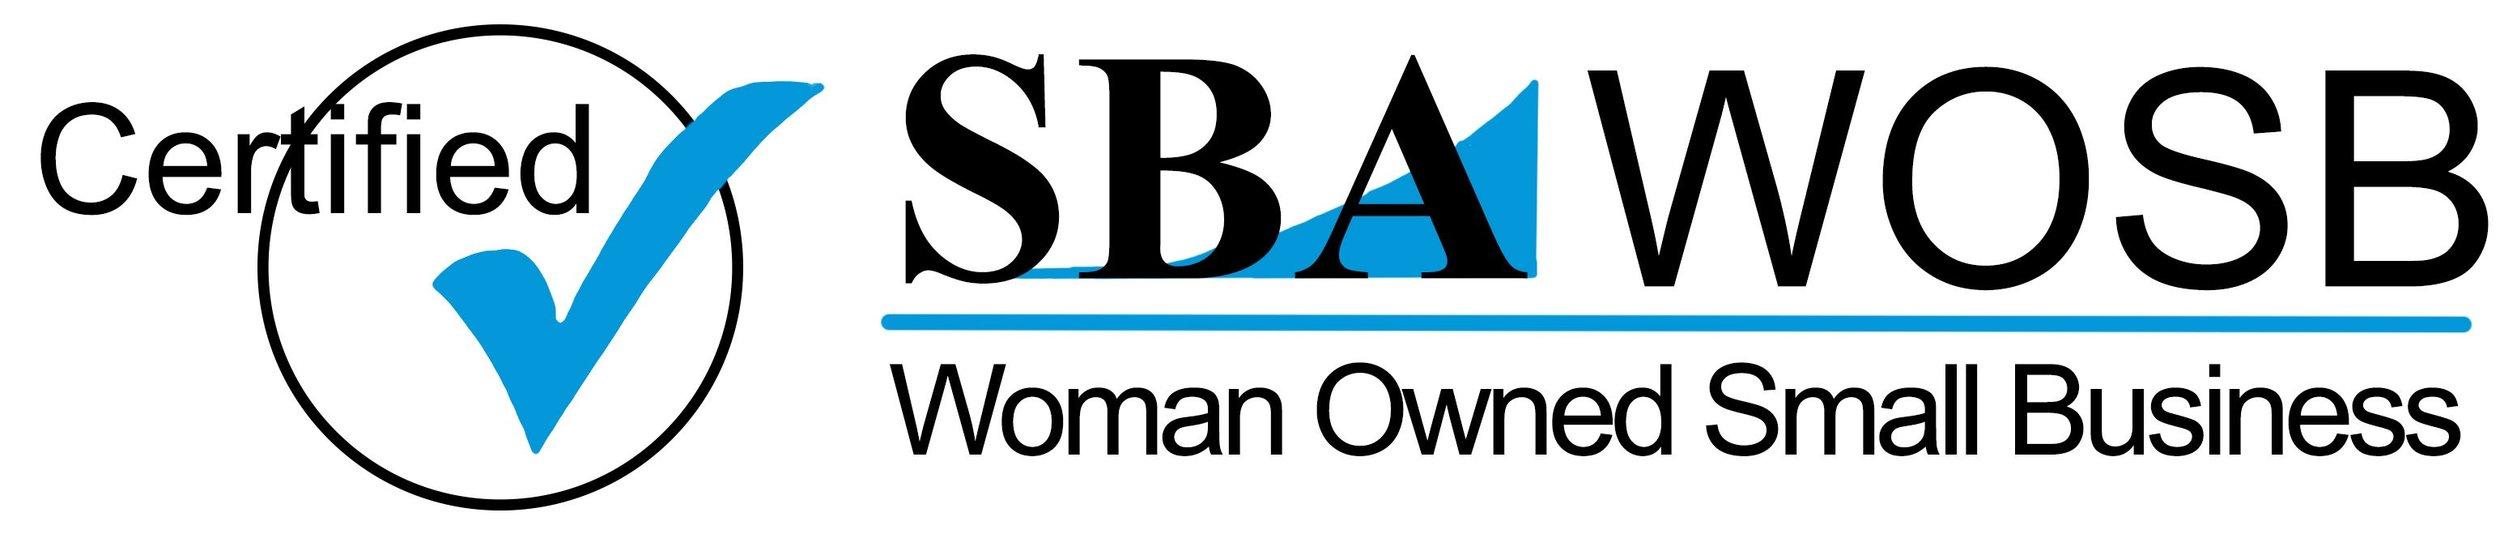 WOSB_SBA_LOGO3.jpg